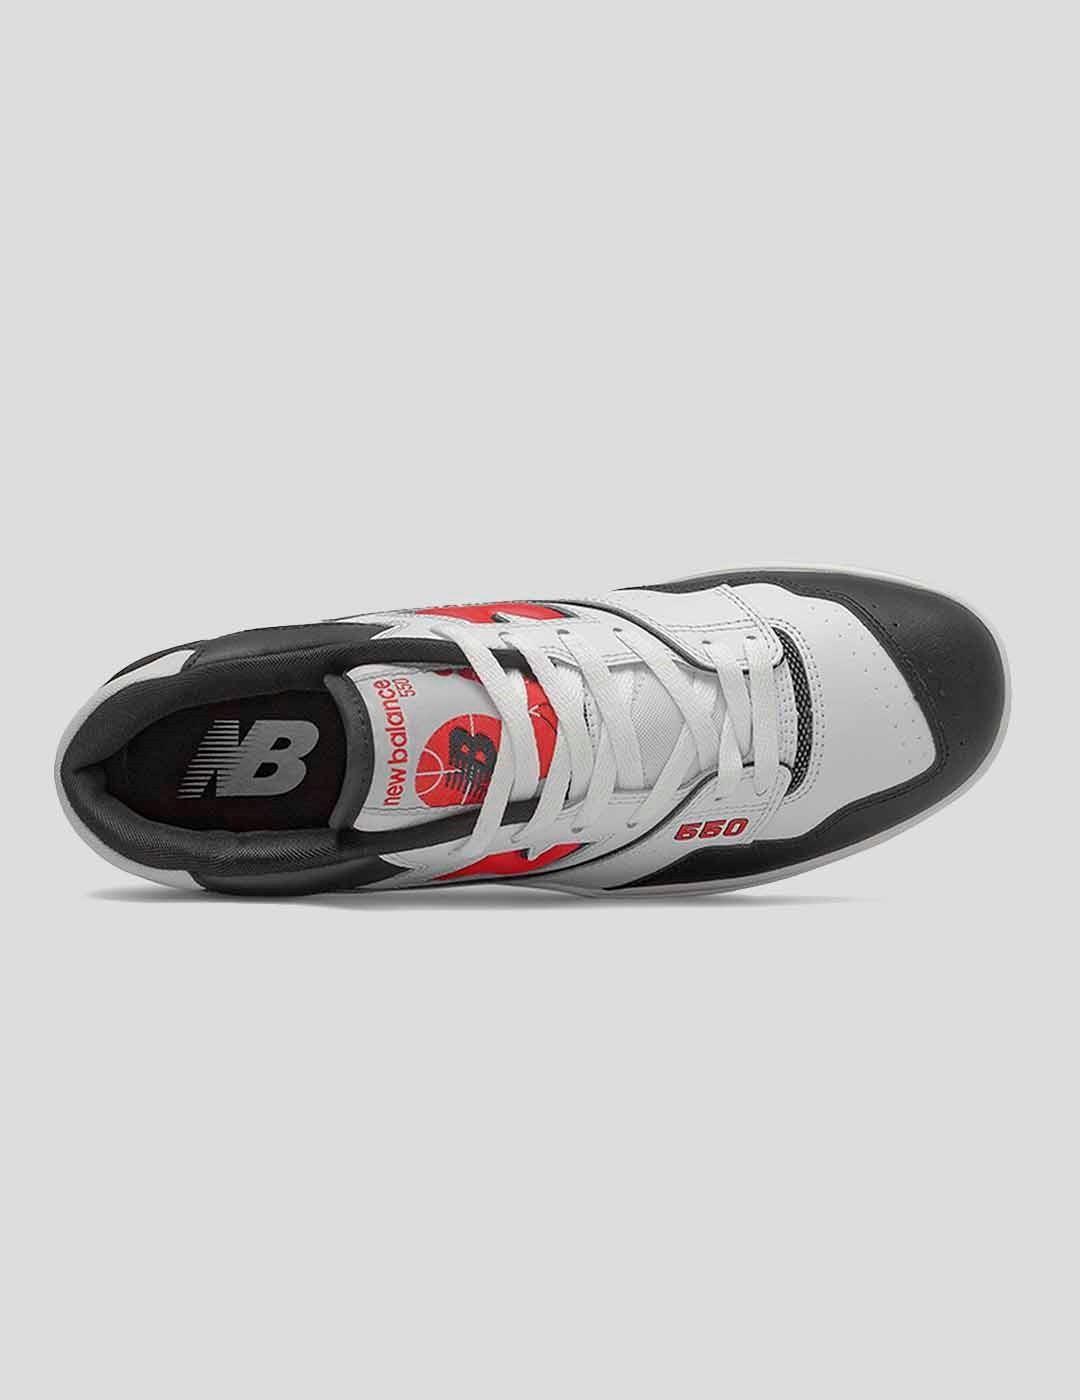 ZAPATILLAS NEW BALANCE 550 HR1 SPORT RED BLACK WHITE